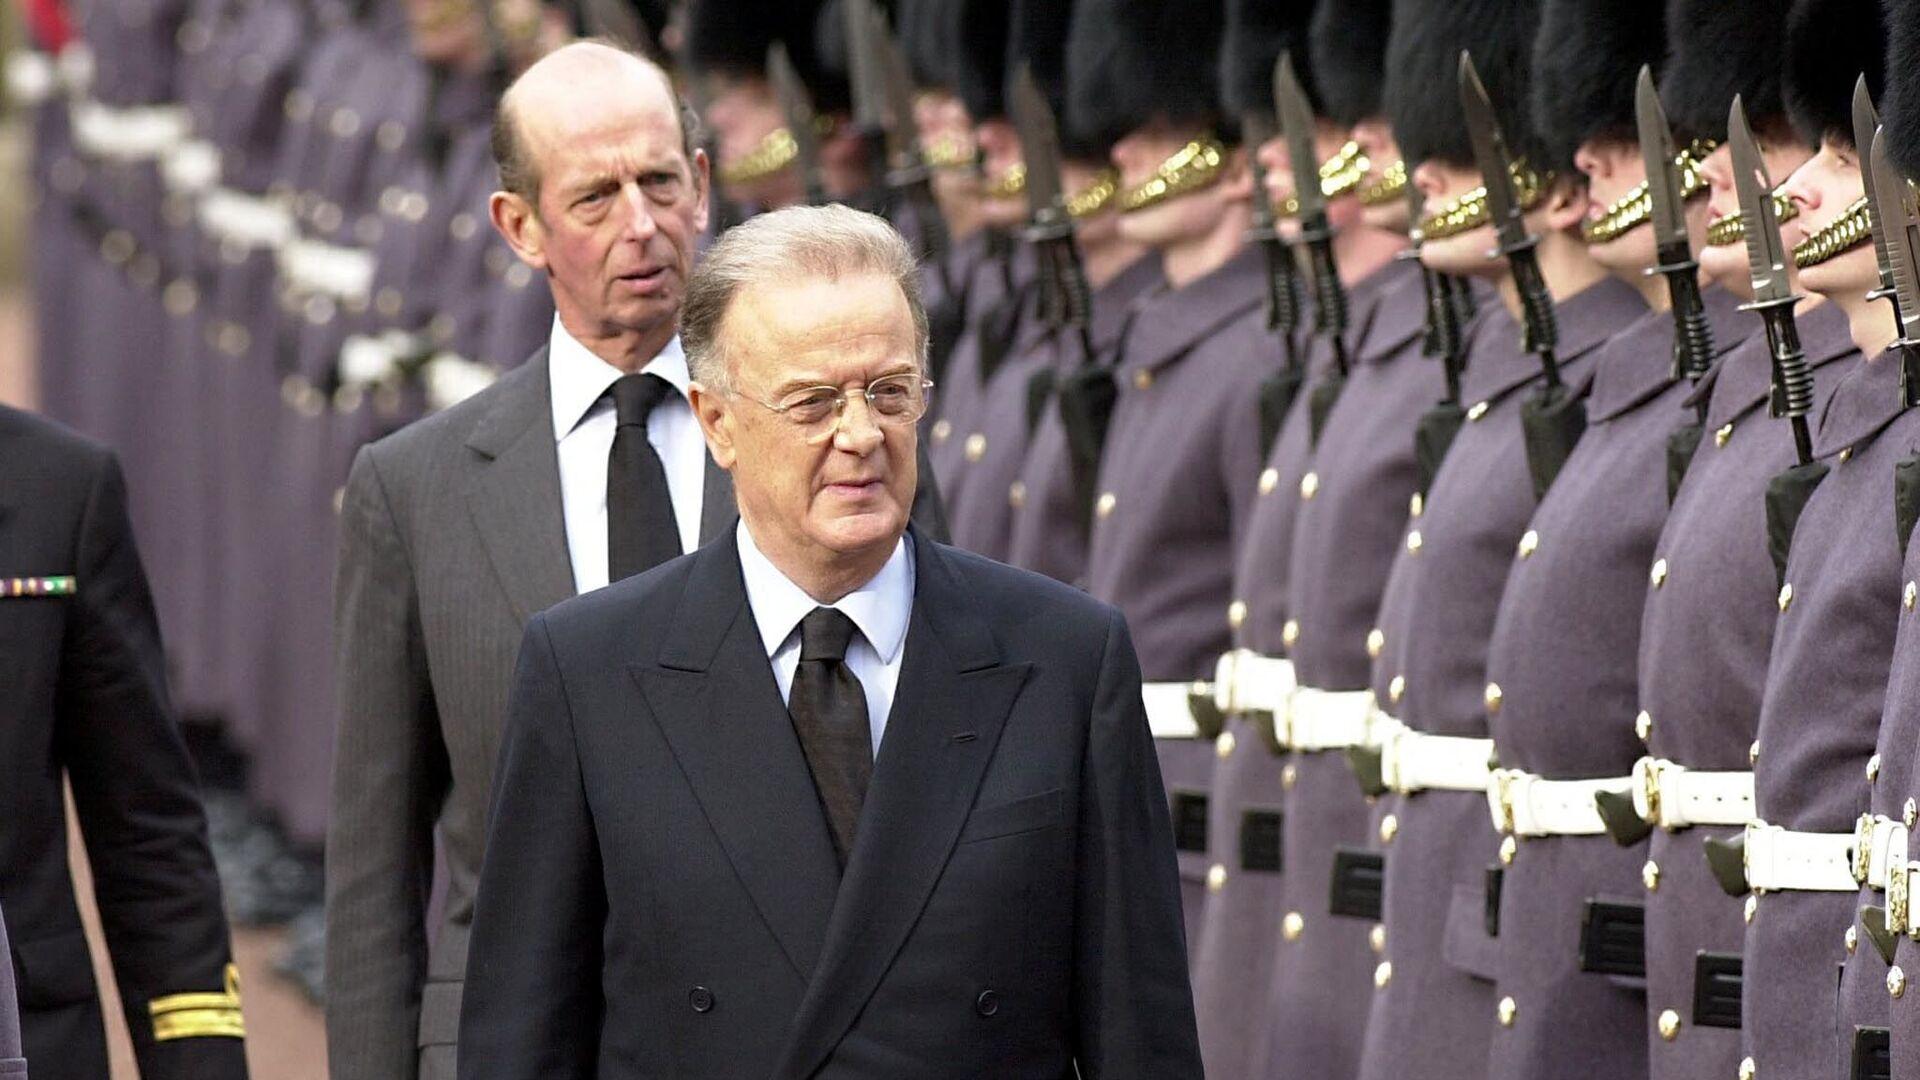 Jorge Sampaio, Ex Presidente del Portogallo - Sputnik Italia, 1920, 10.09.2021